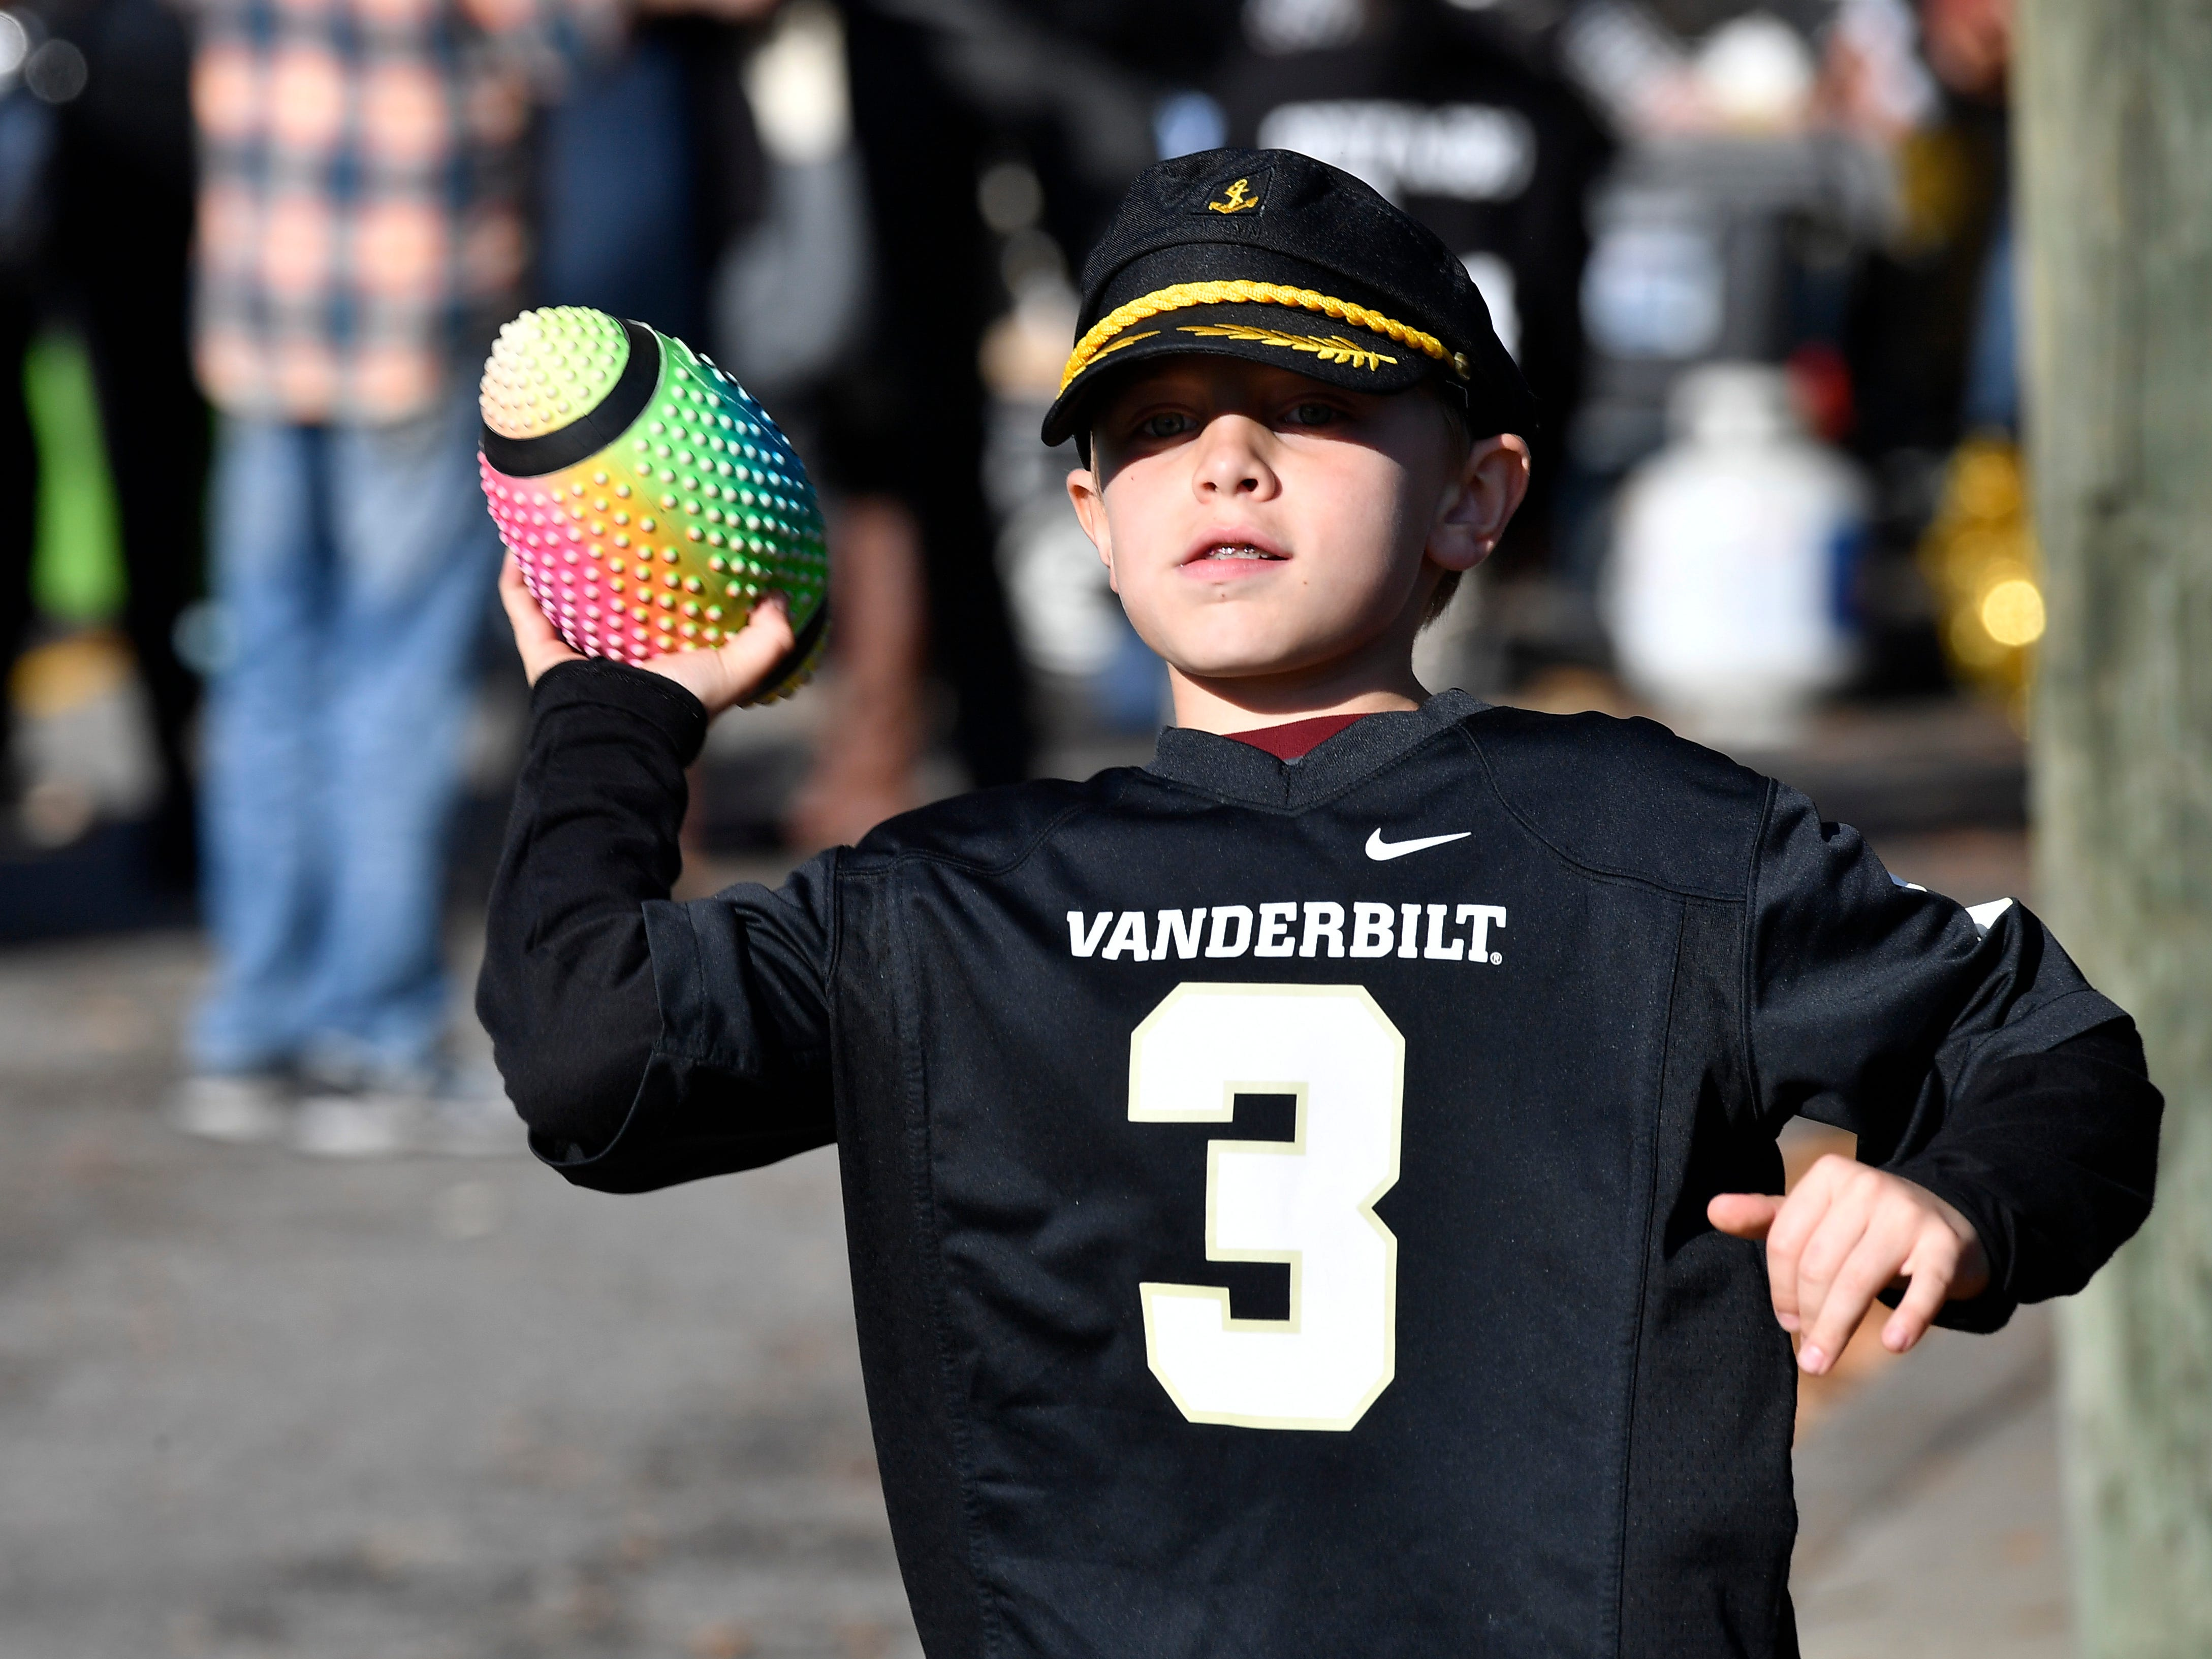 Vandy fan Brady Watts, 8, plays before the game at Vanderbilt Stadium Saturday, Nov. 24, 2018, in Nashville, Tenn.